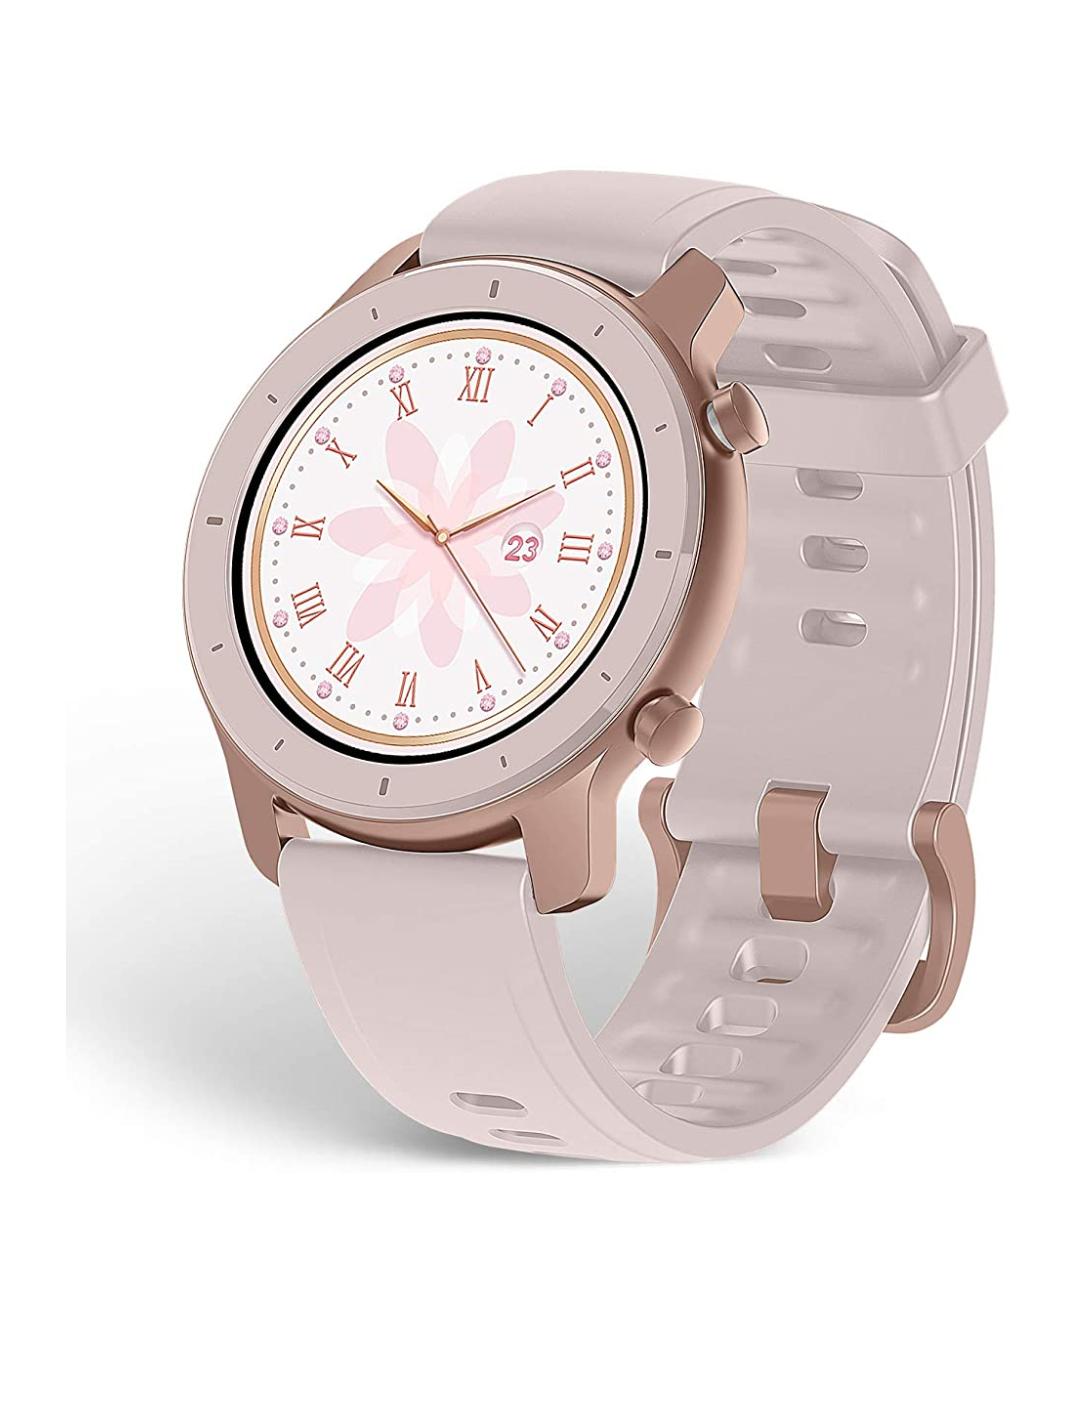 Amazfit Smartwatch GTR 42mm 1,2 Zoll Touch Control Farbdisplay Sportuhr Fitness Armbanduhr 5 ATM wasserdicht Amazon Prime